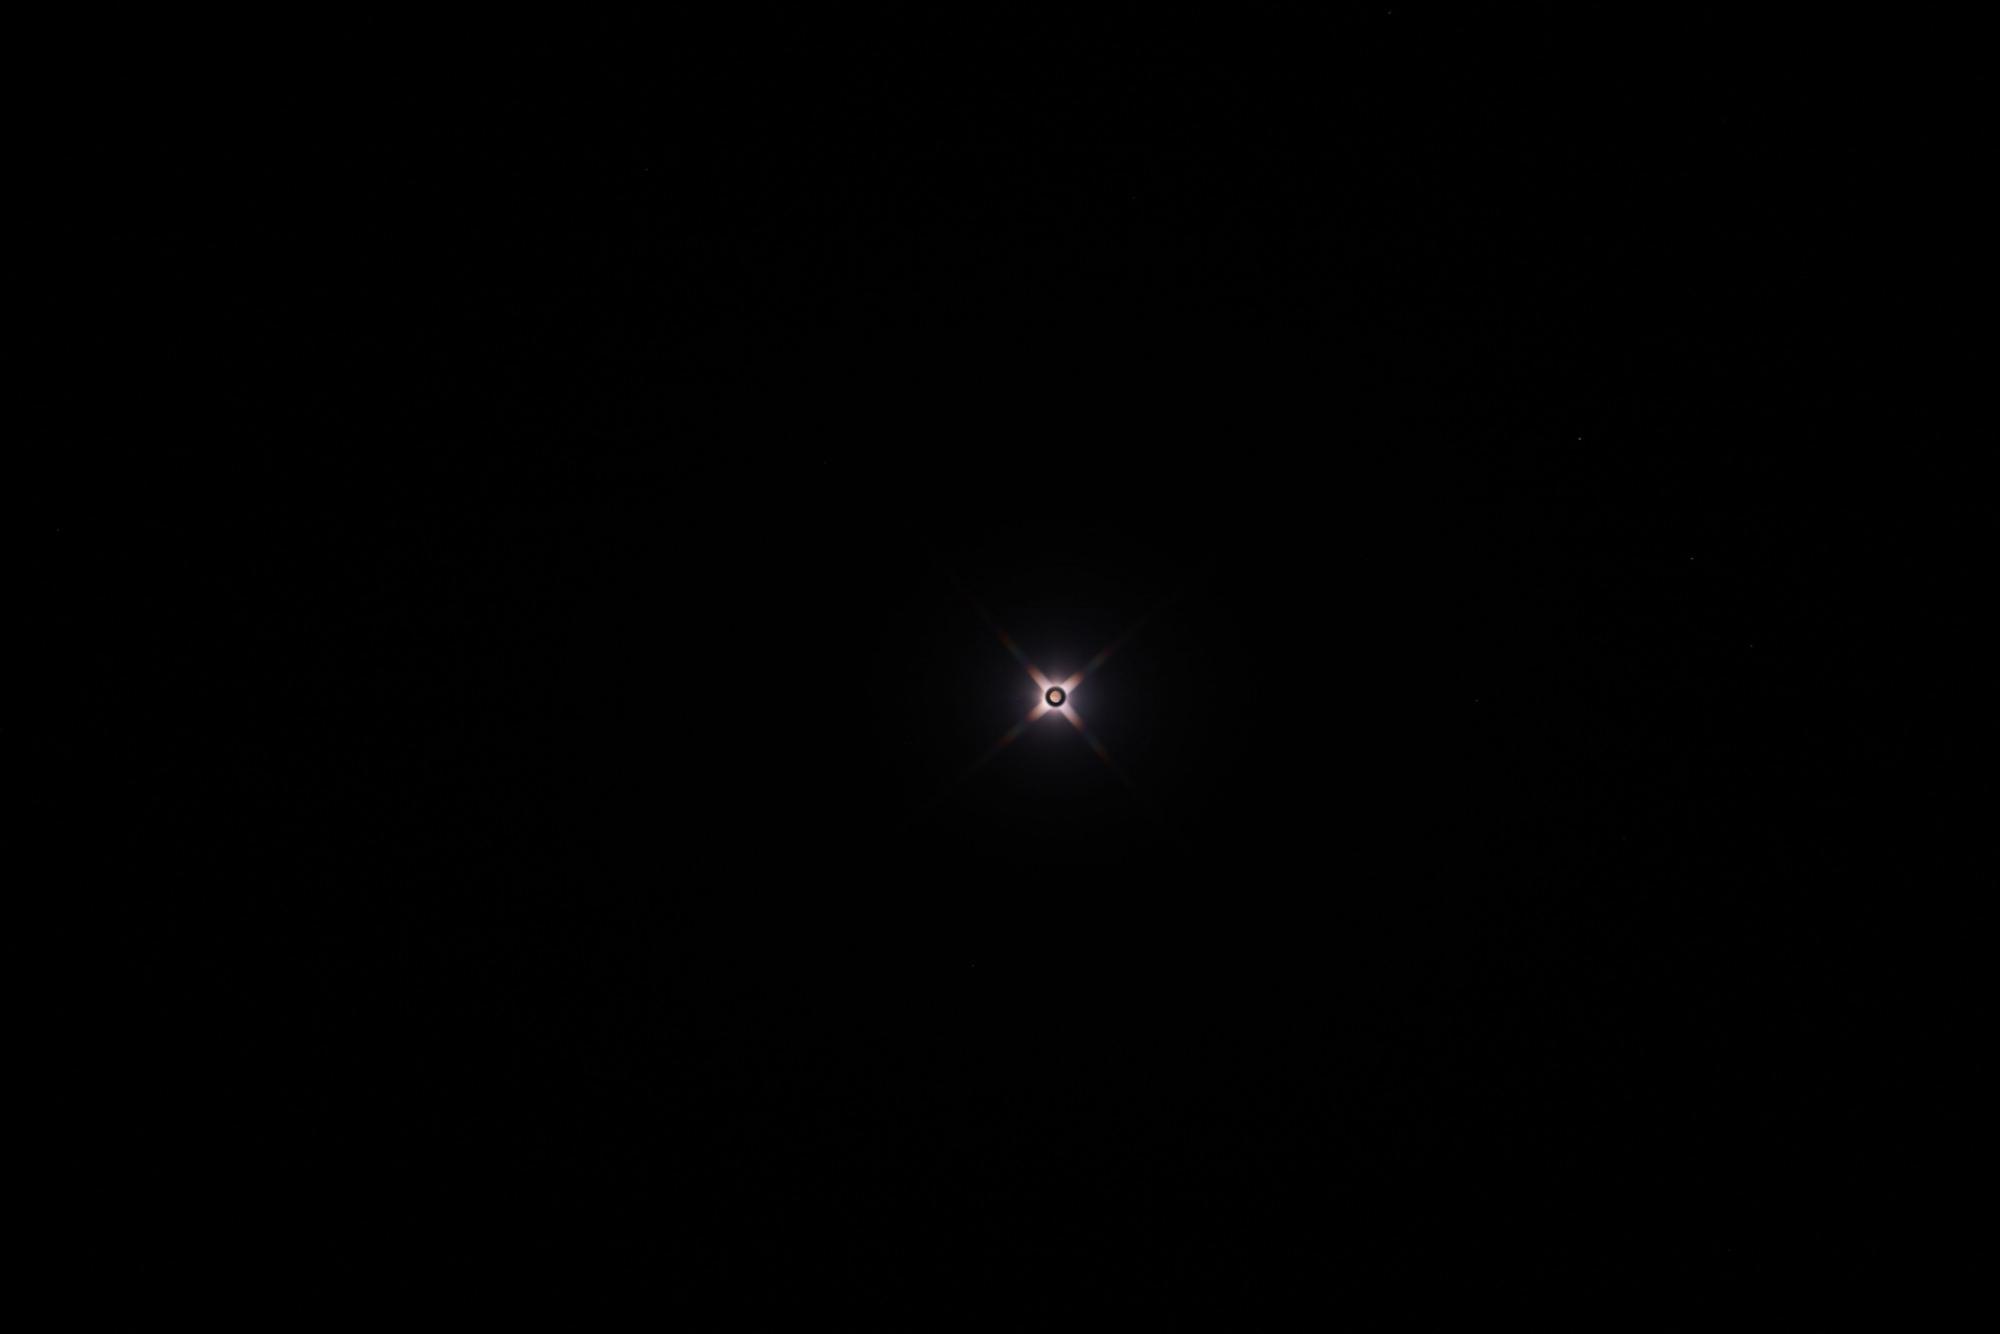 9 satellites Mars 21h37 TU 12 novembre 2858B2 send.jpg